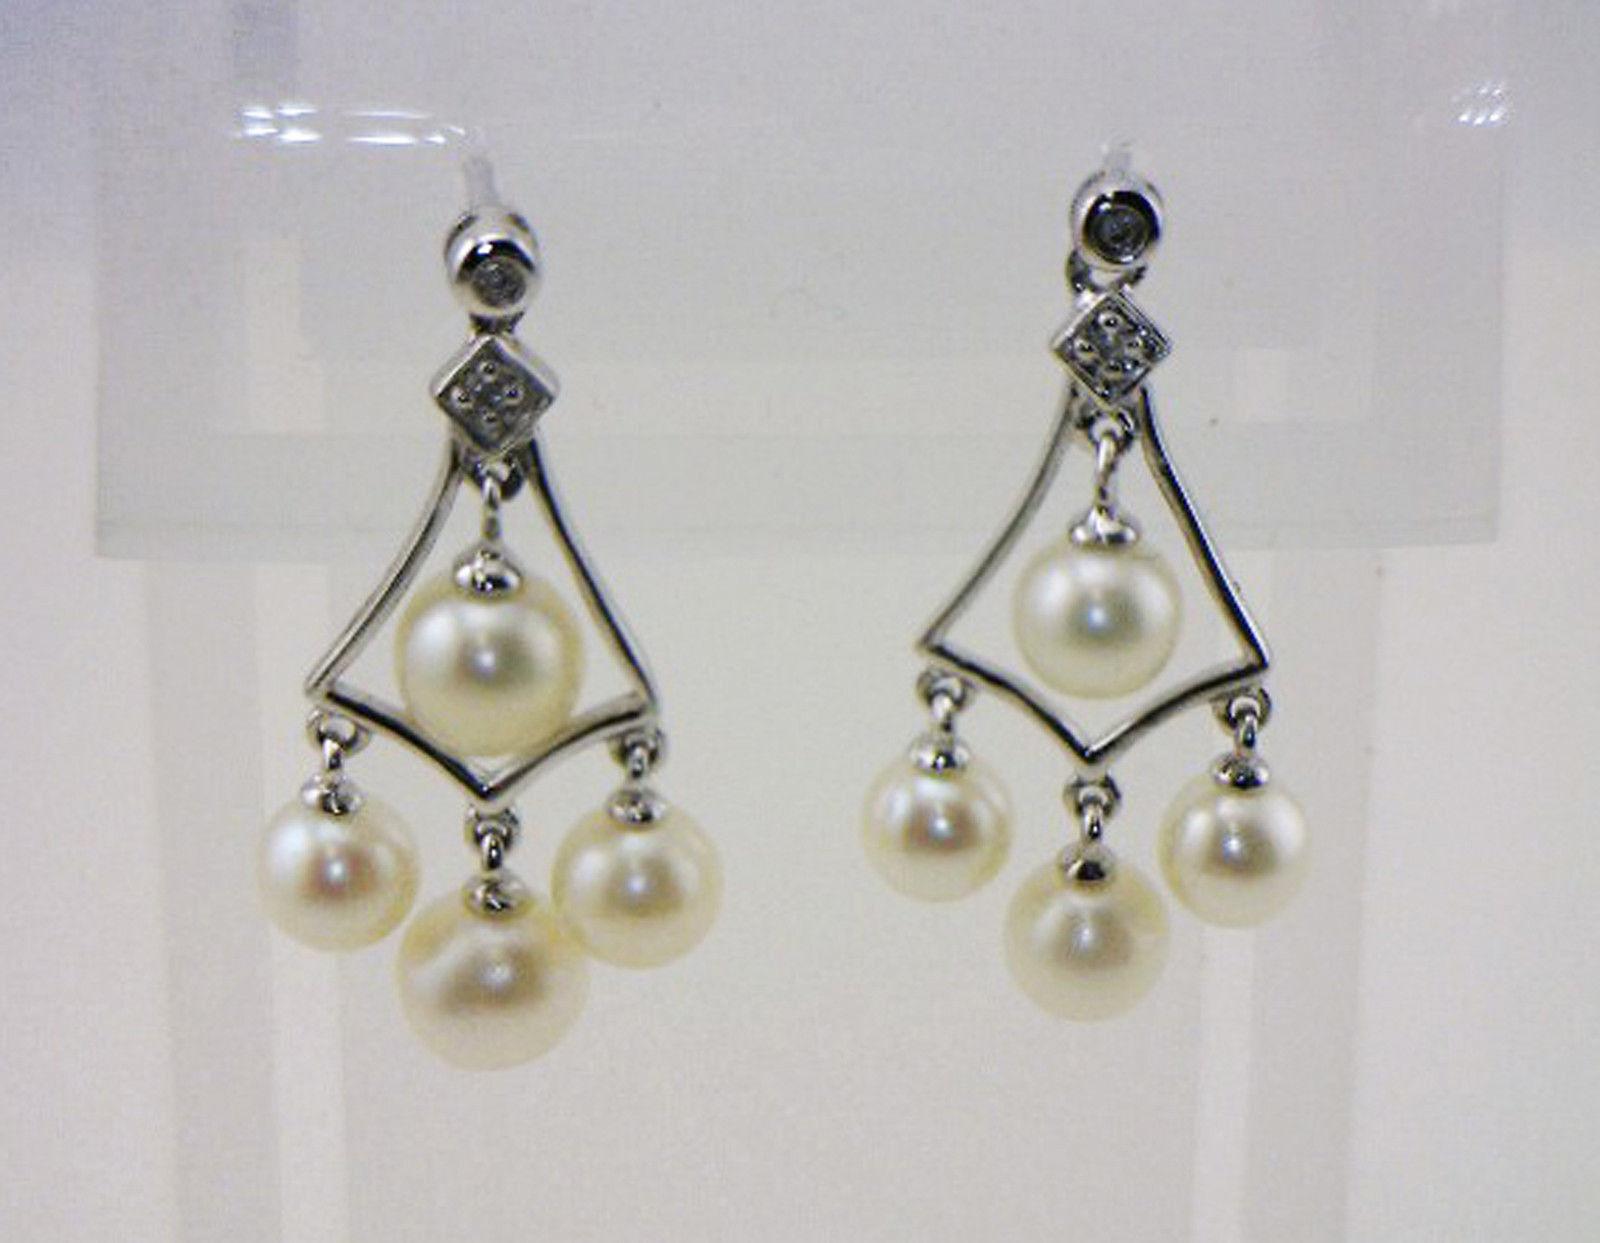 BEAUTIFUL WHITE PEARLS  DIAMOND ACCENT DANGLES 14K WHITE gold EARRINGS NIB  J118